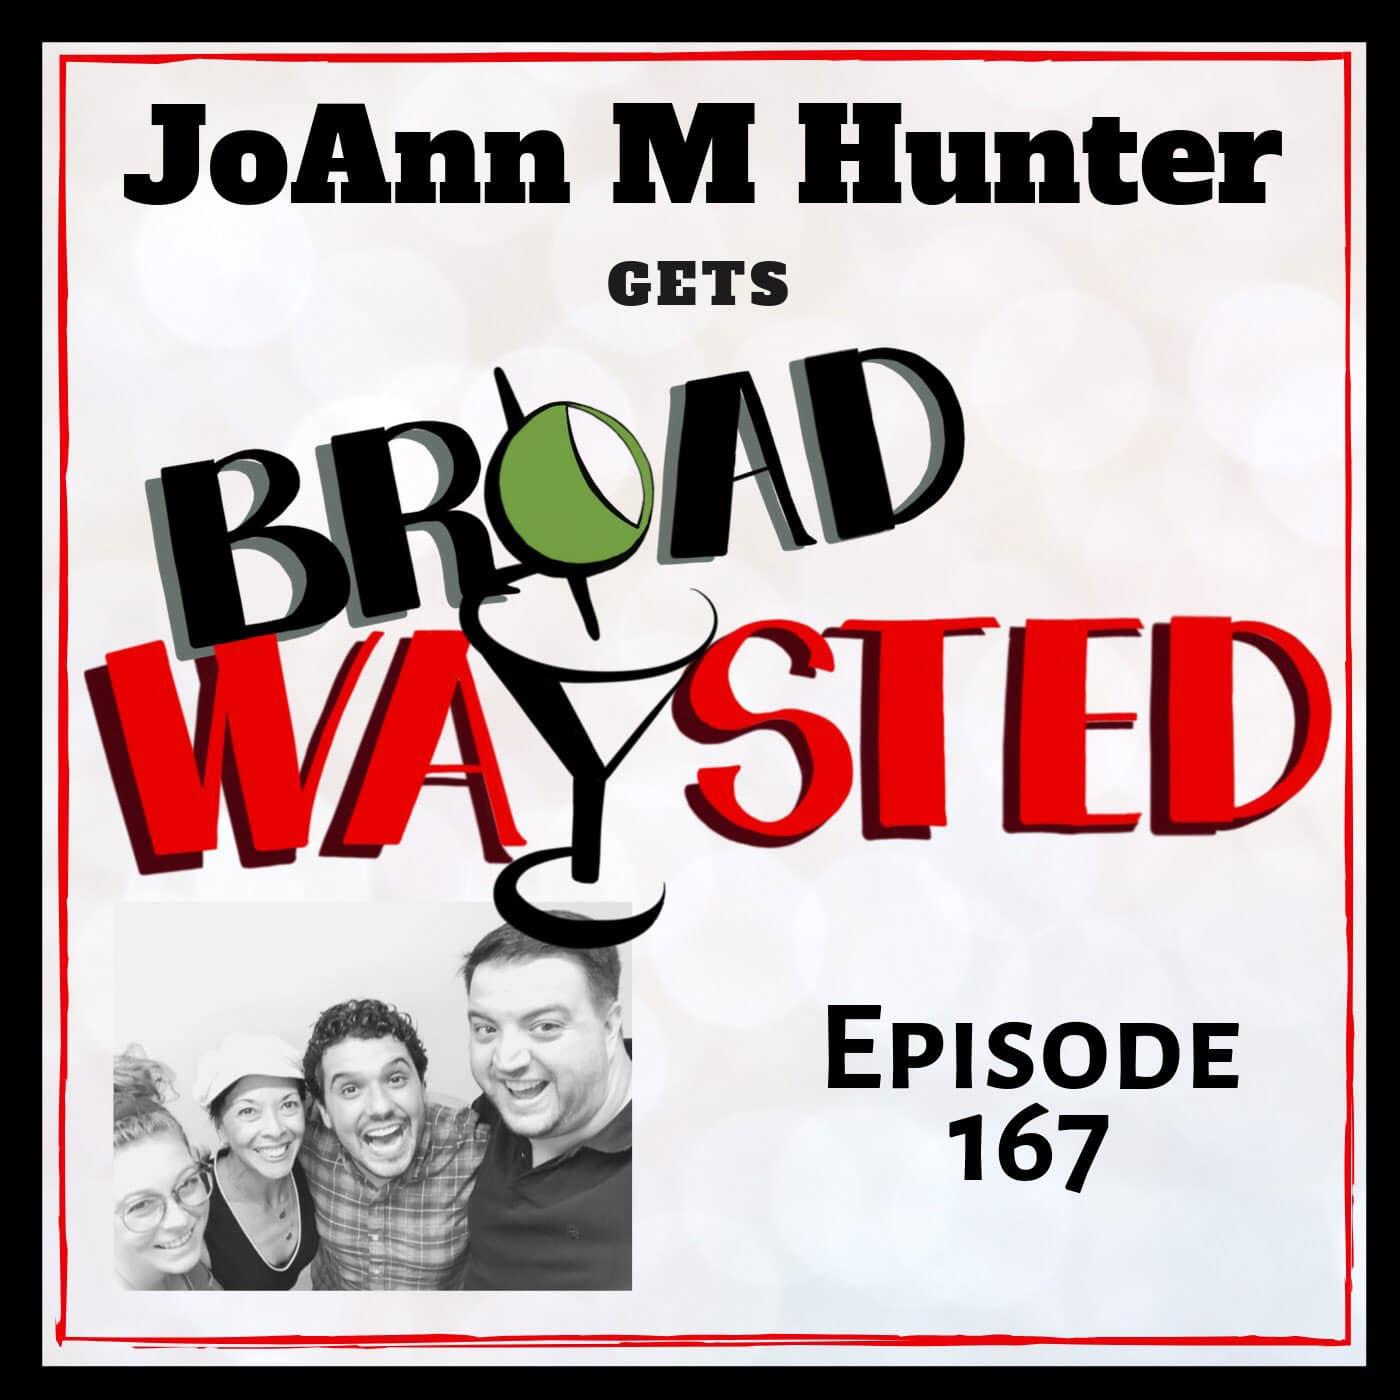 Broadwaysted Ep 167 JoAnn M Hunter